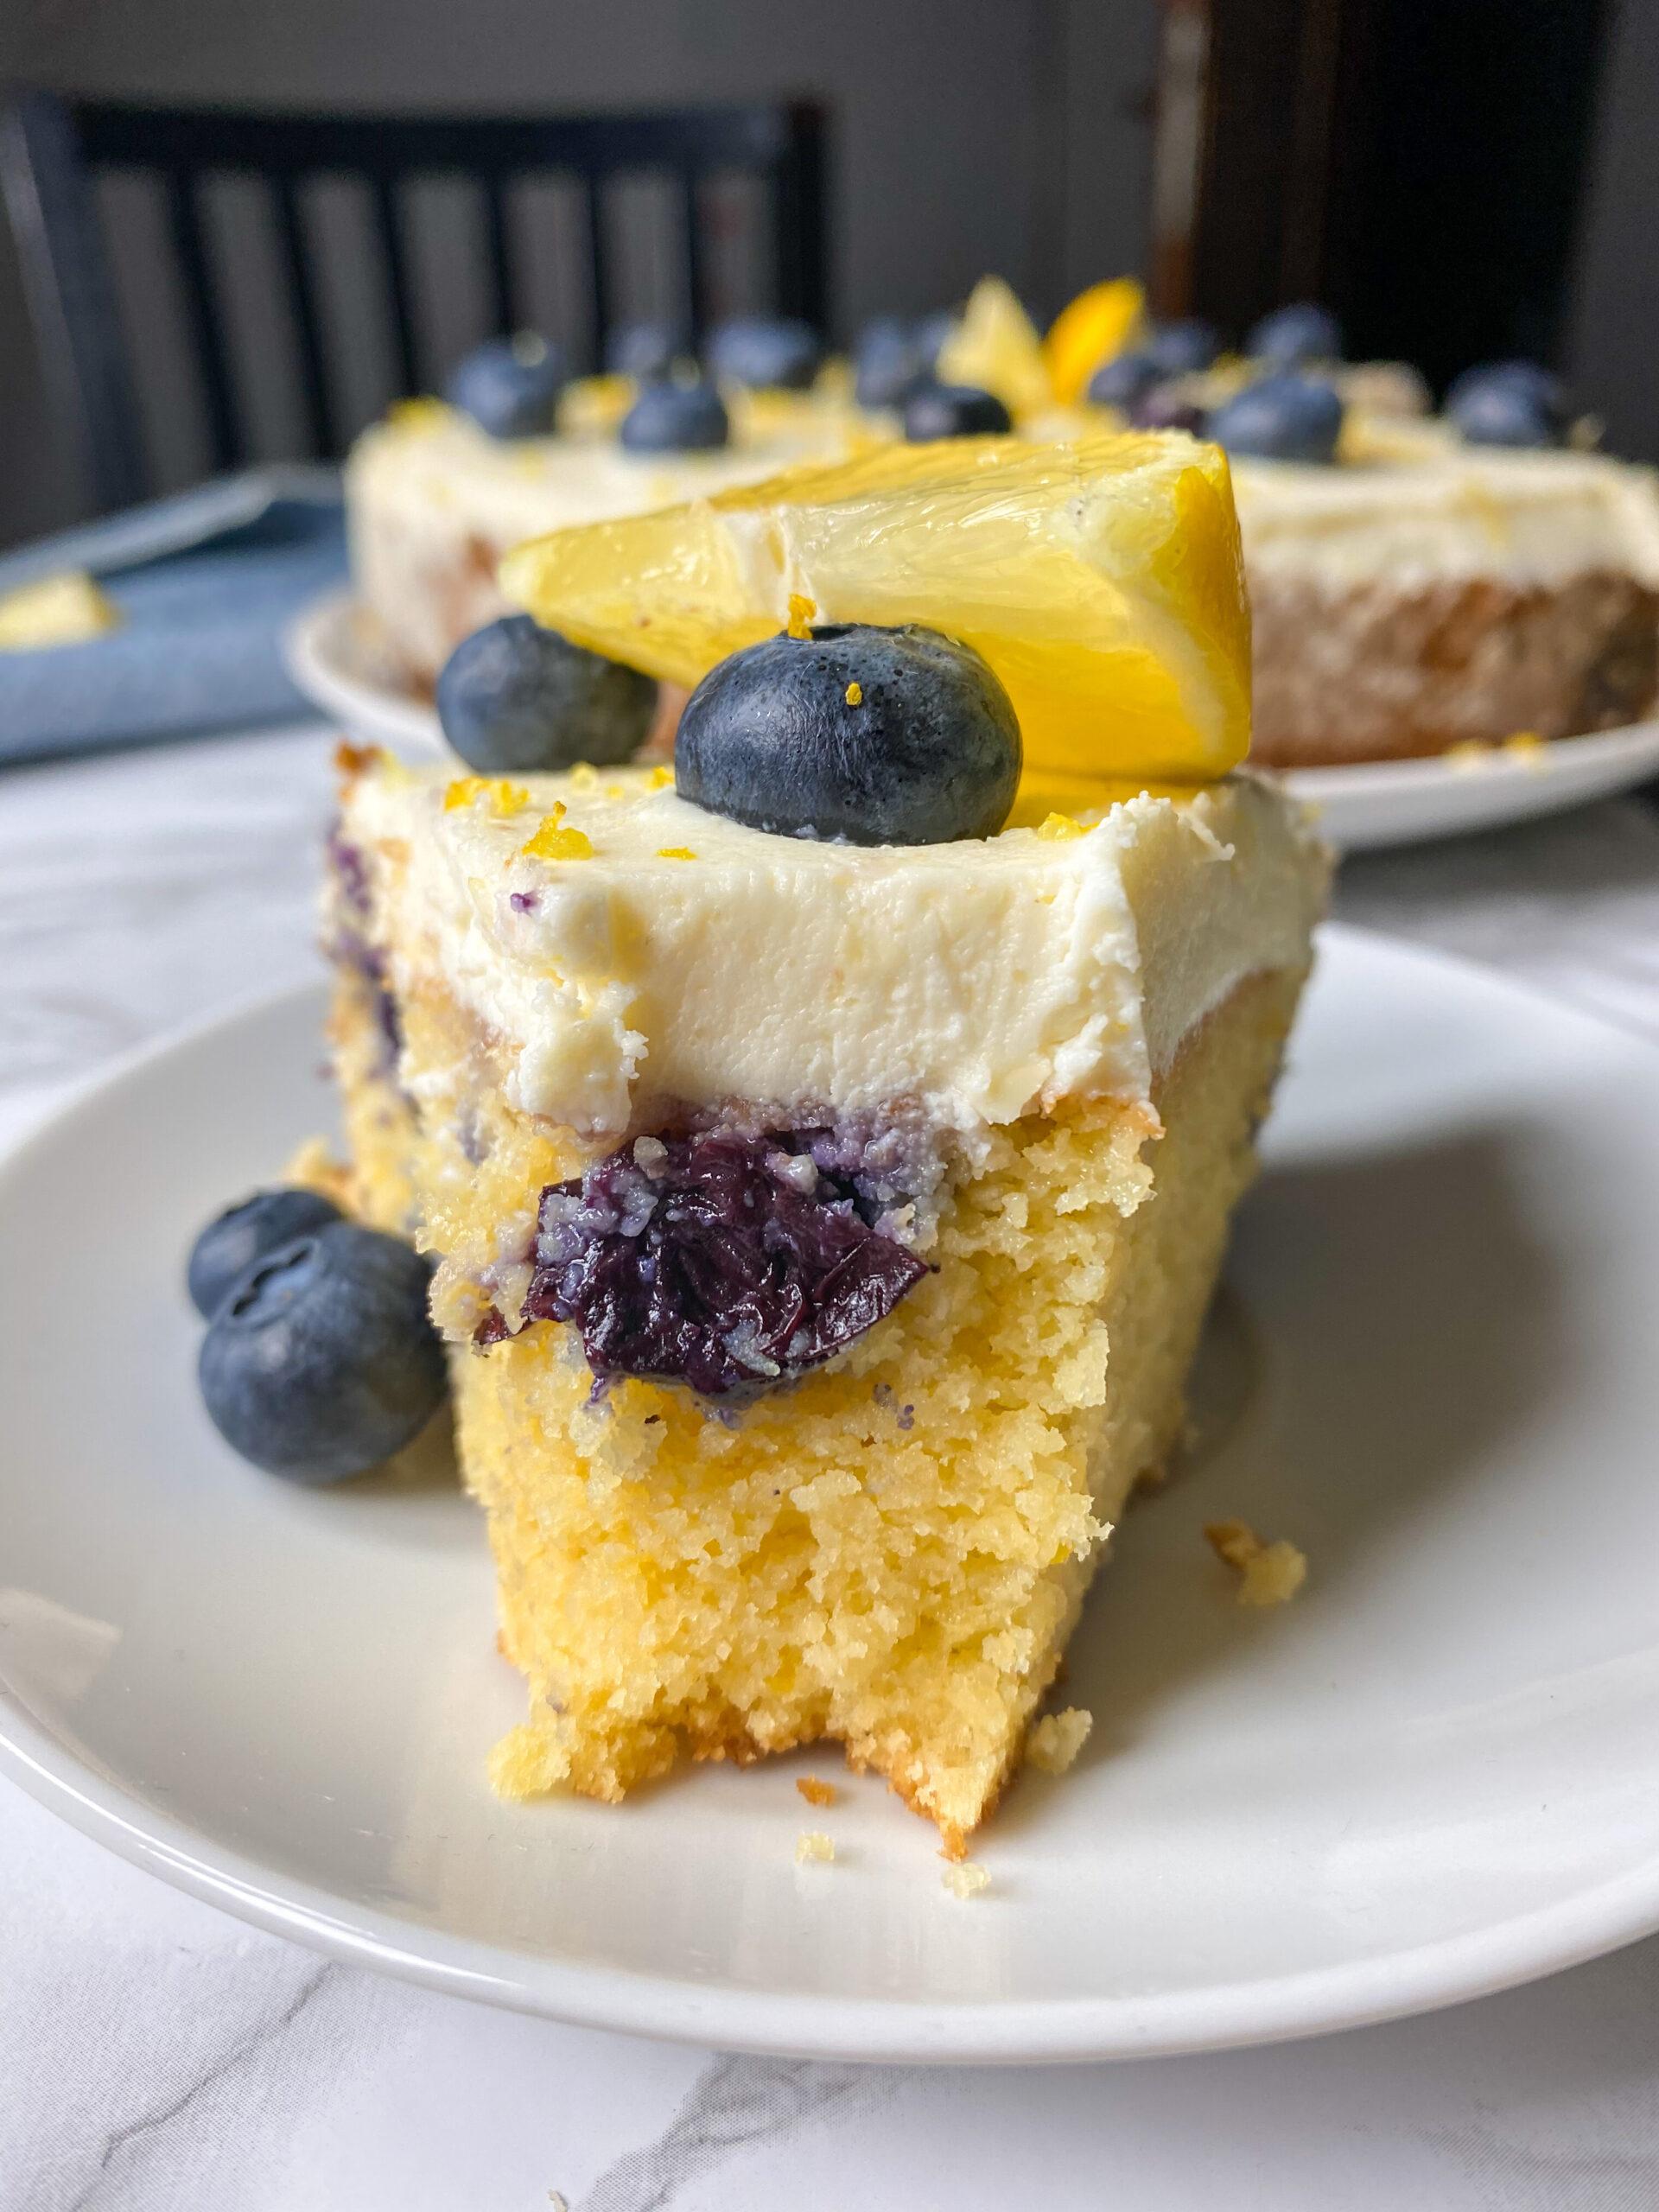 Picture of keto lemon blueberry cake